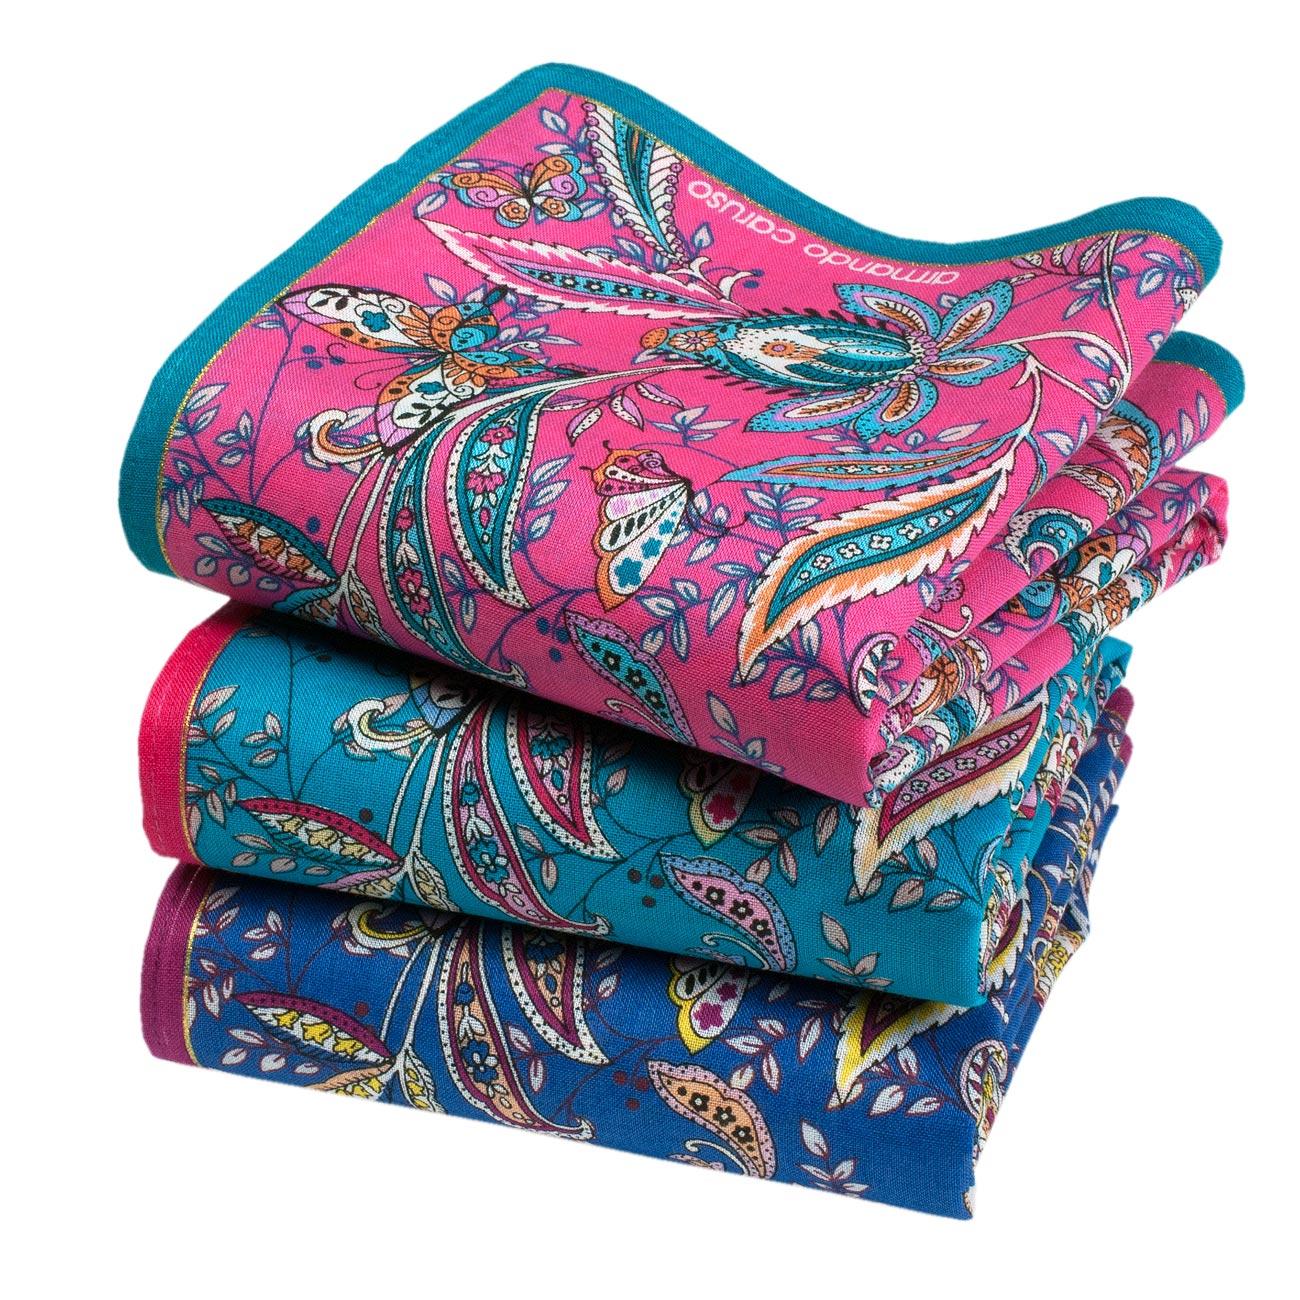 Beaux mouchoirs HESPERIE (x3)